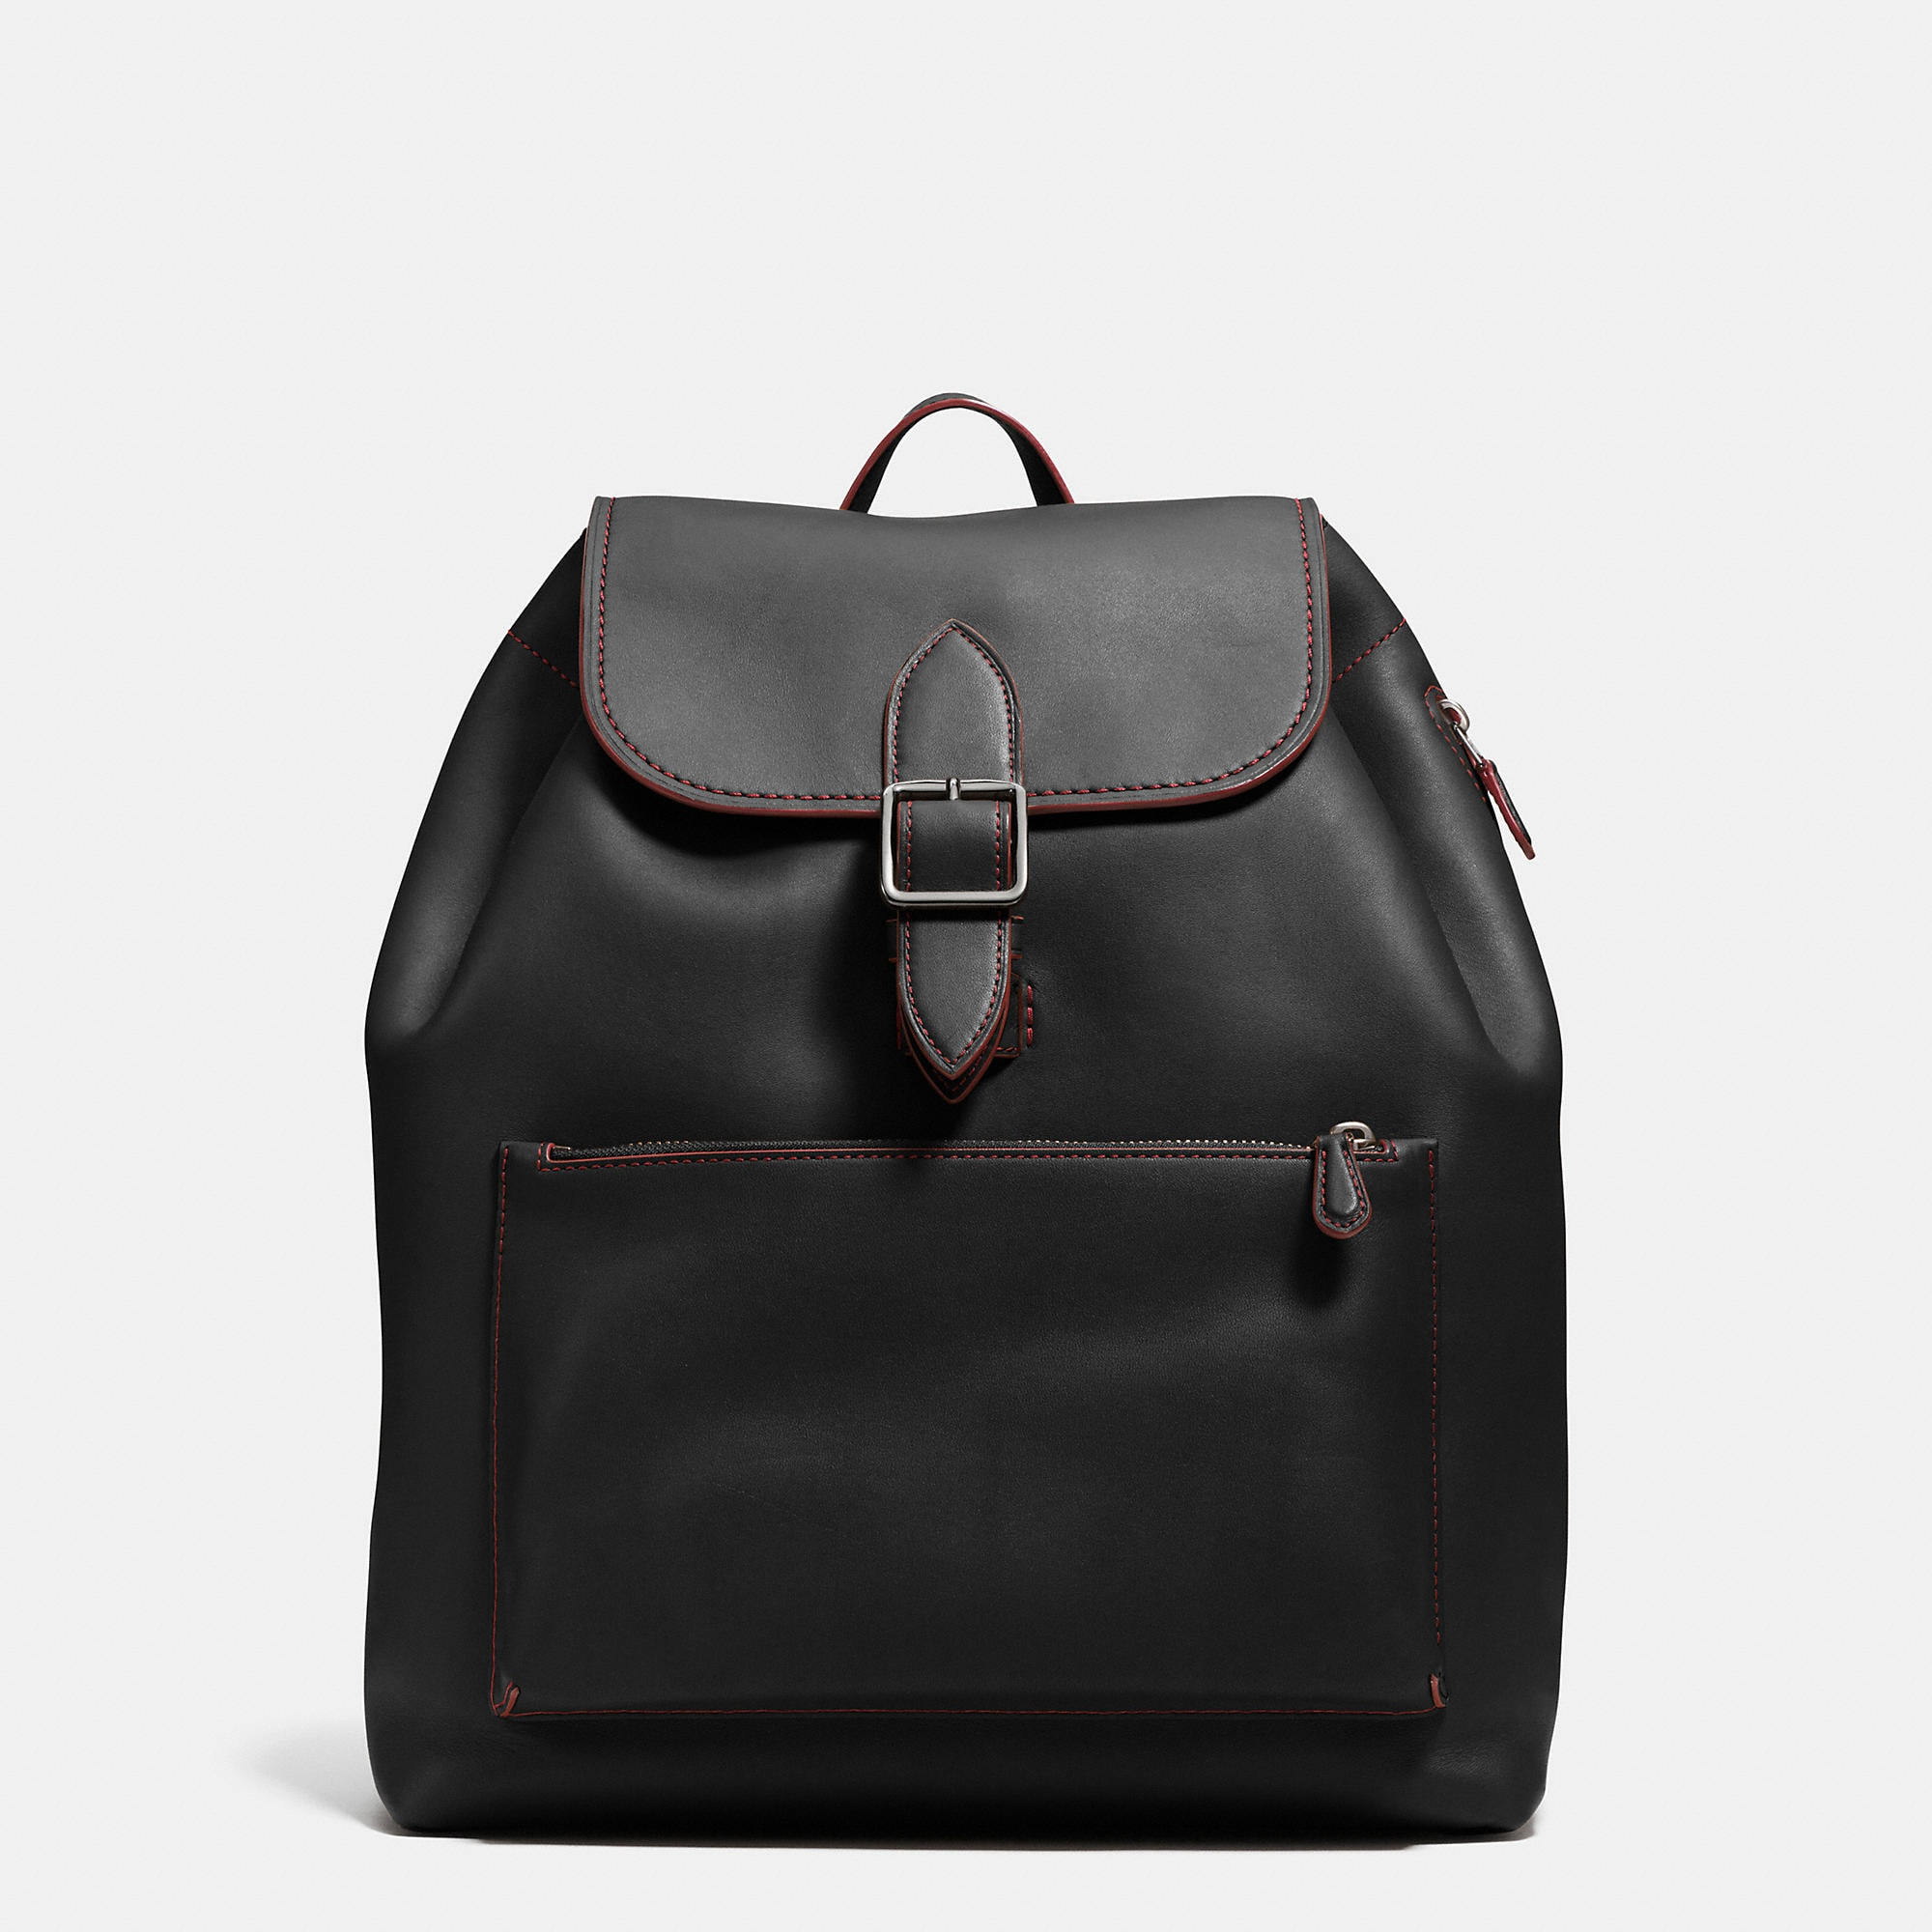 Coach Archival Rucksack In Glovetanned Leather